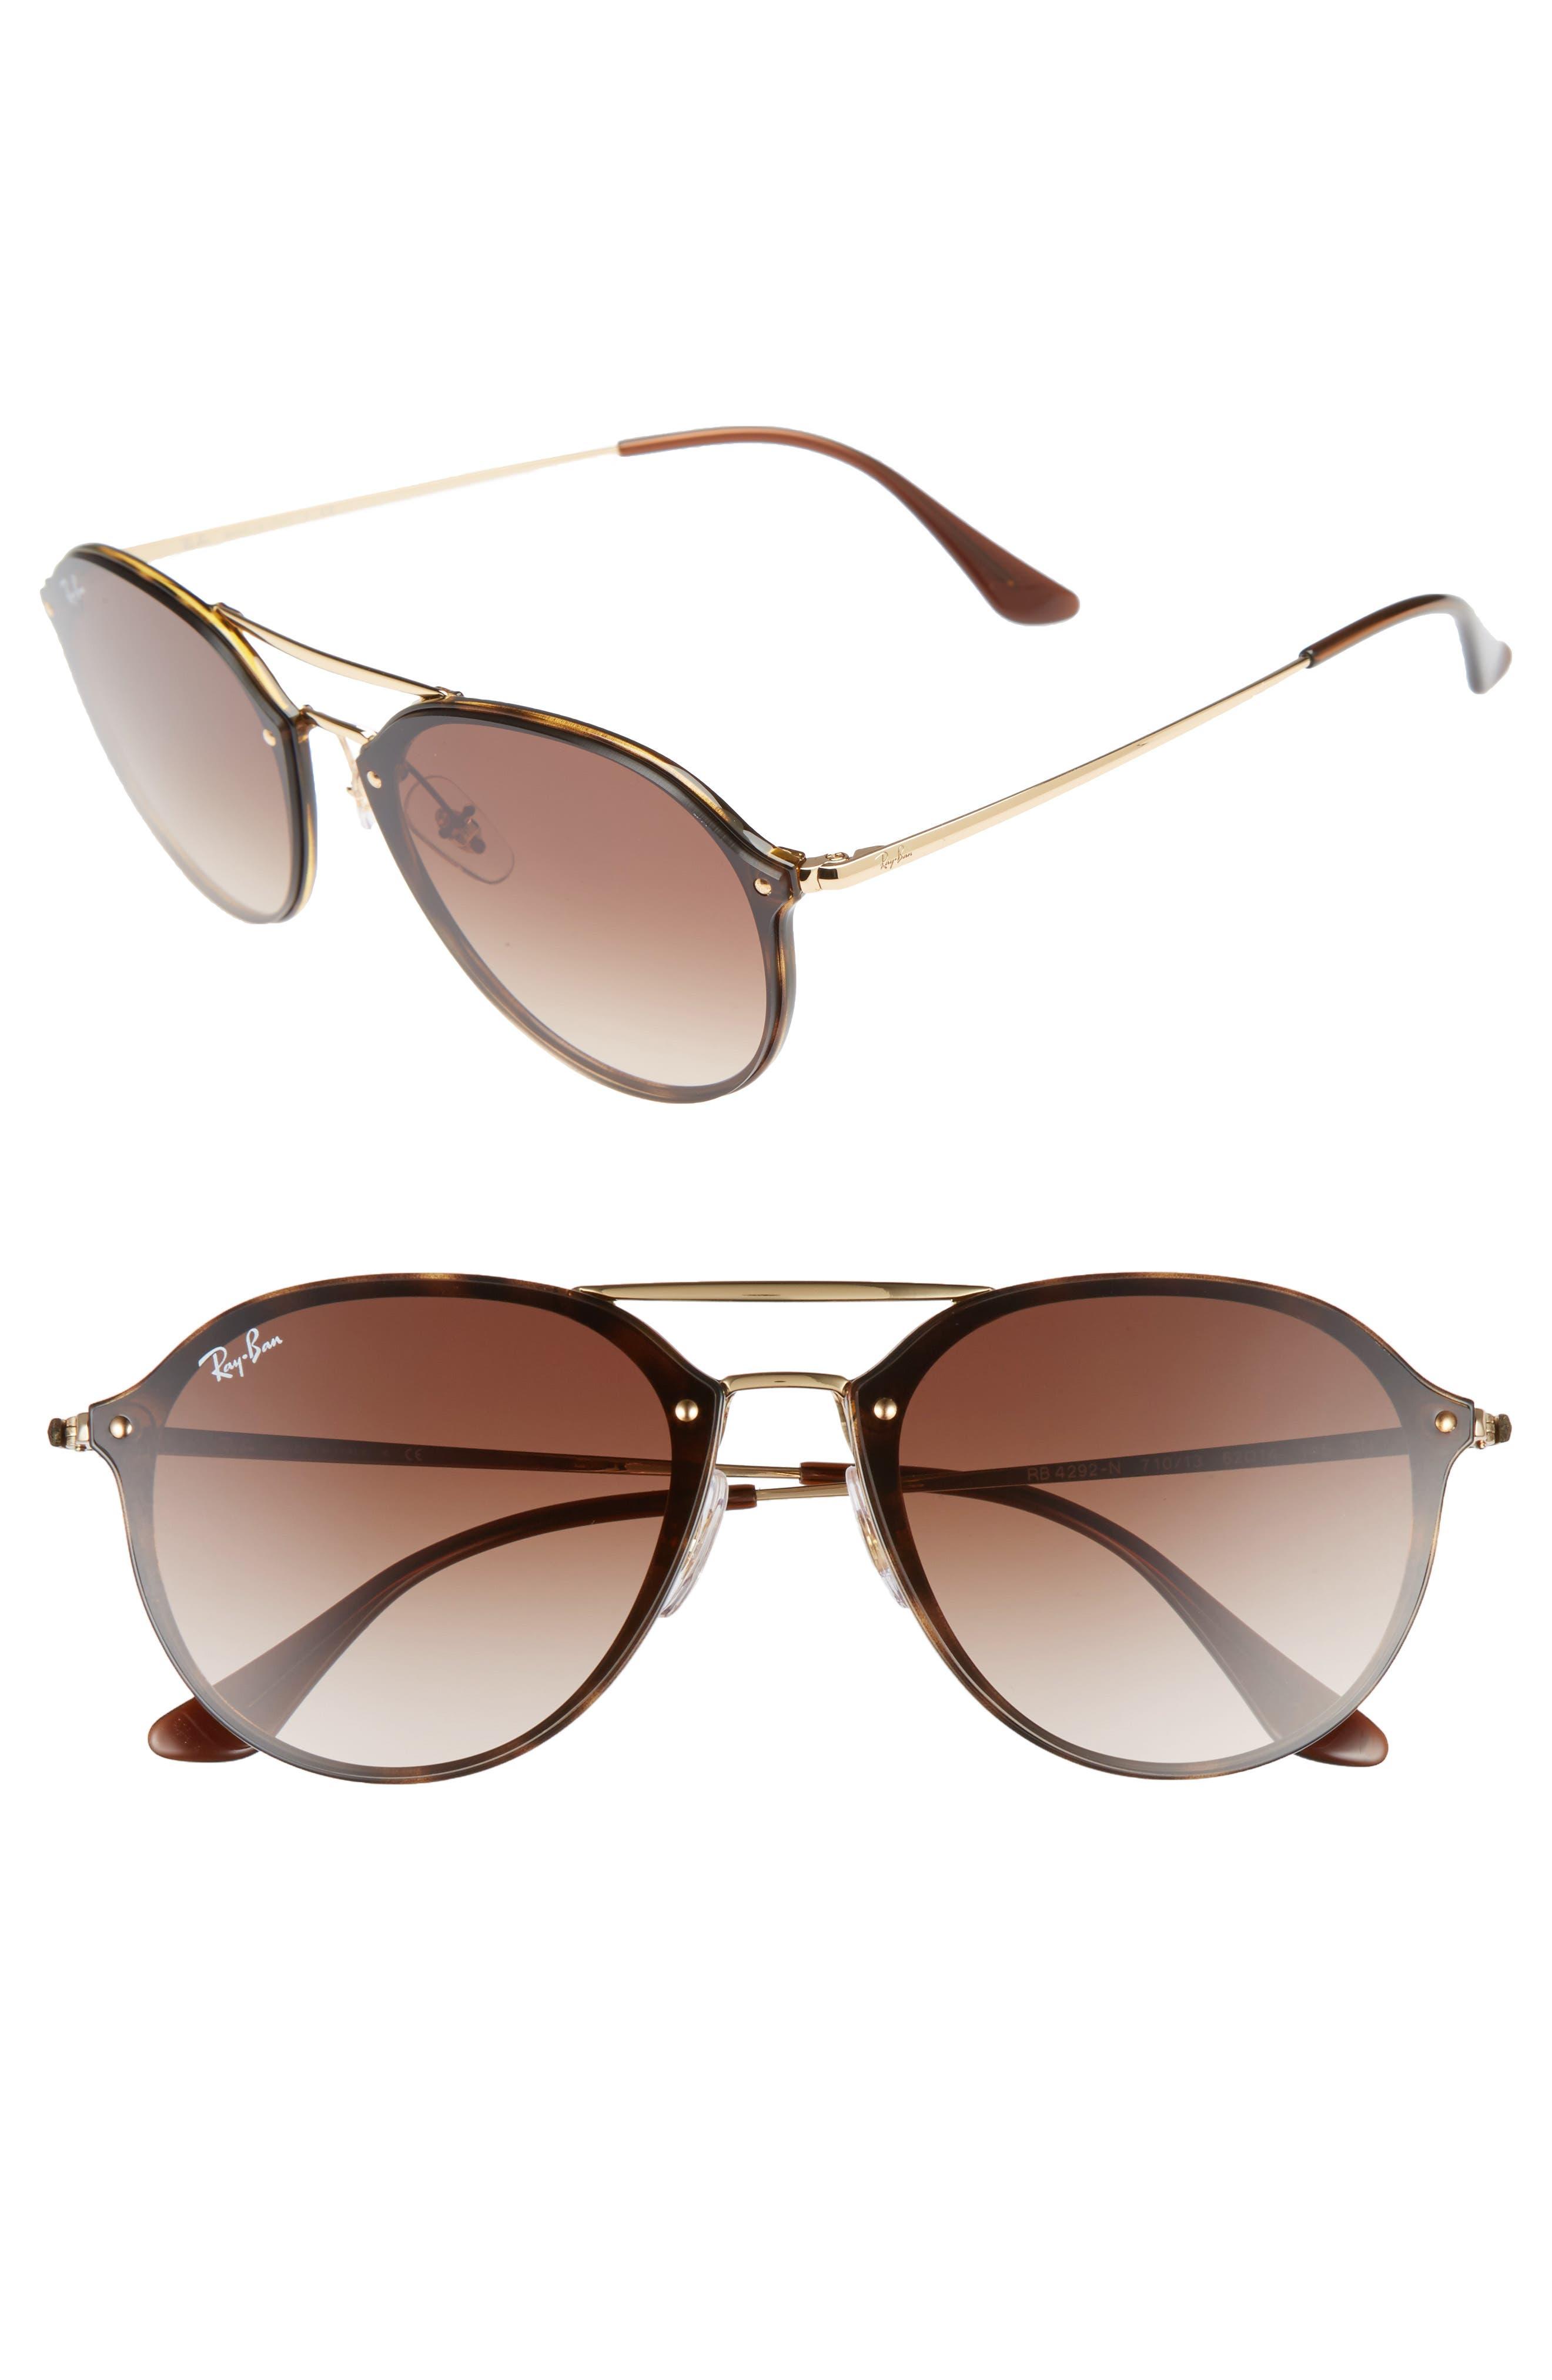 62mm Gradient Lens Aviator Sunglasses, Main, color, HAVANA